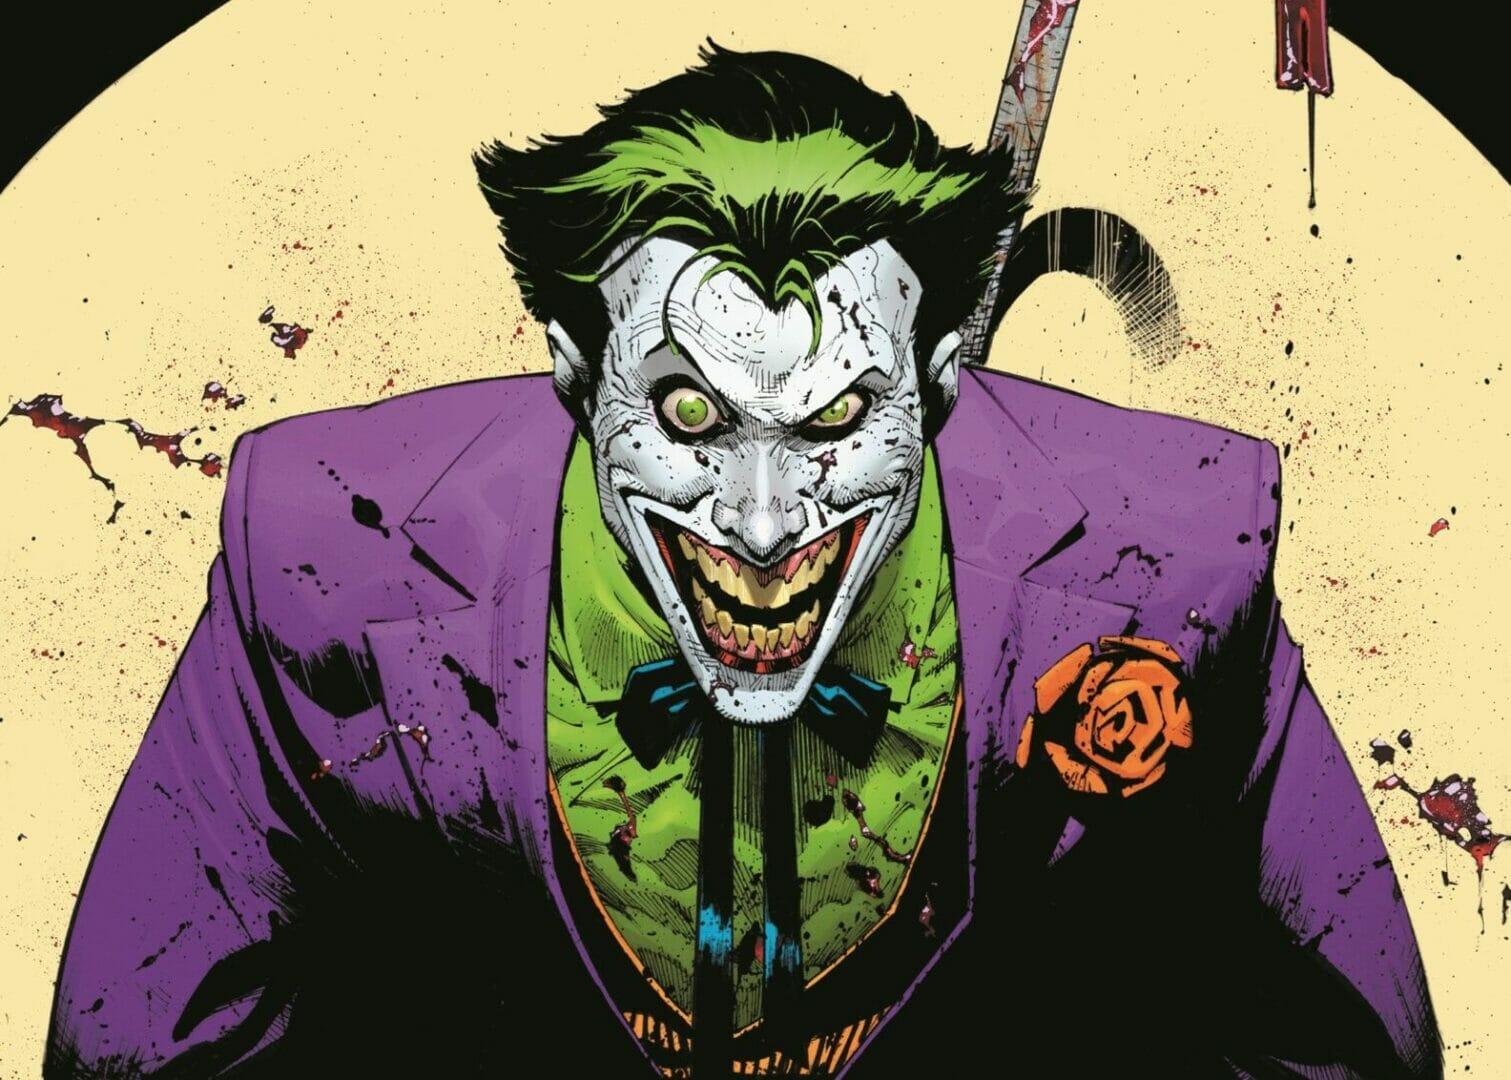 The Joker 80th